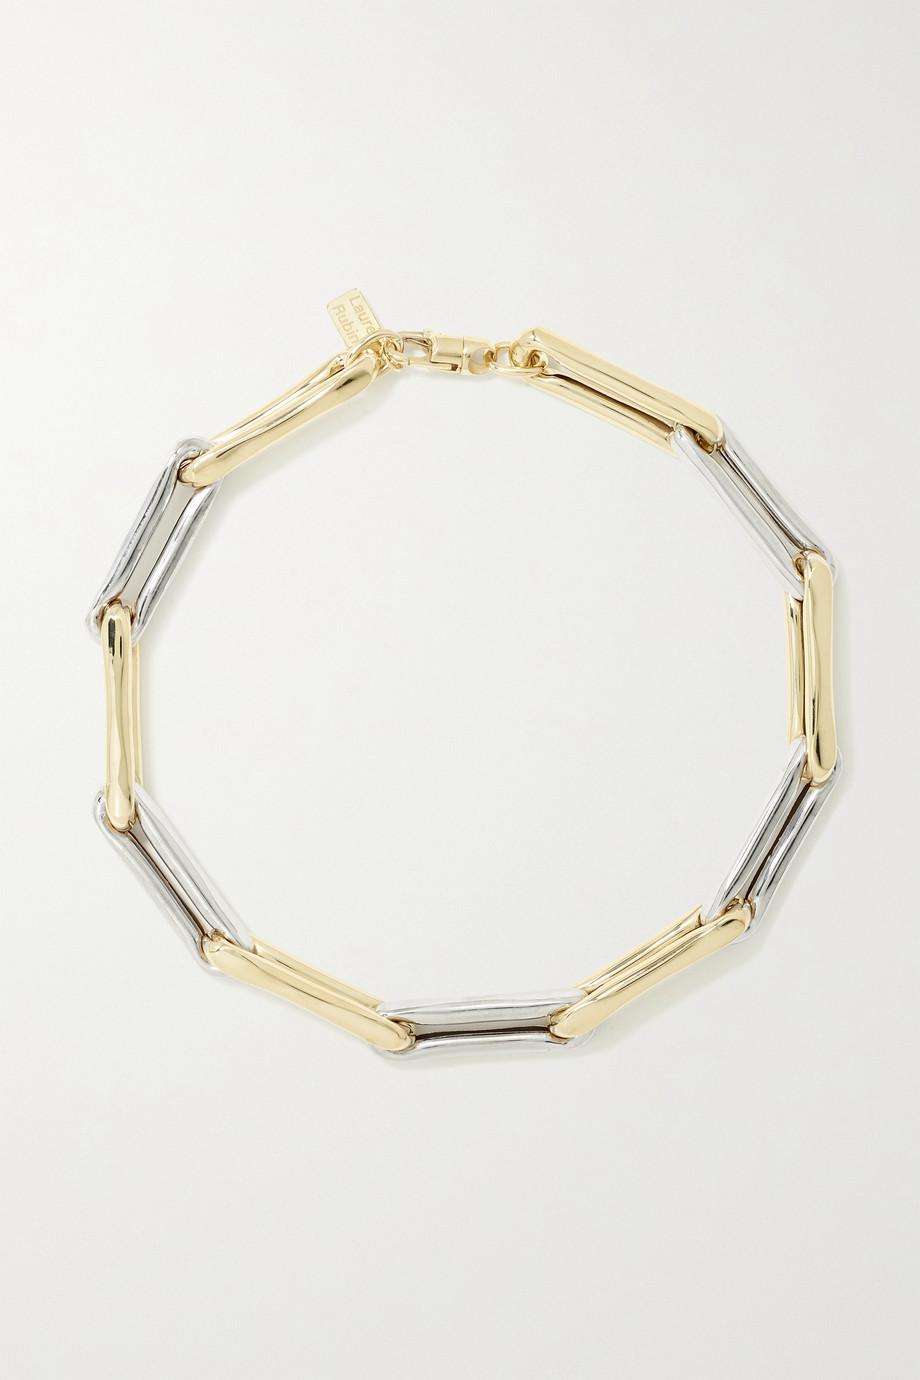 Lauren Rubinski Collier en or jaune et blanc 14 carats (585/1000) Extra Large